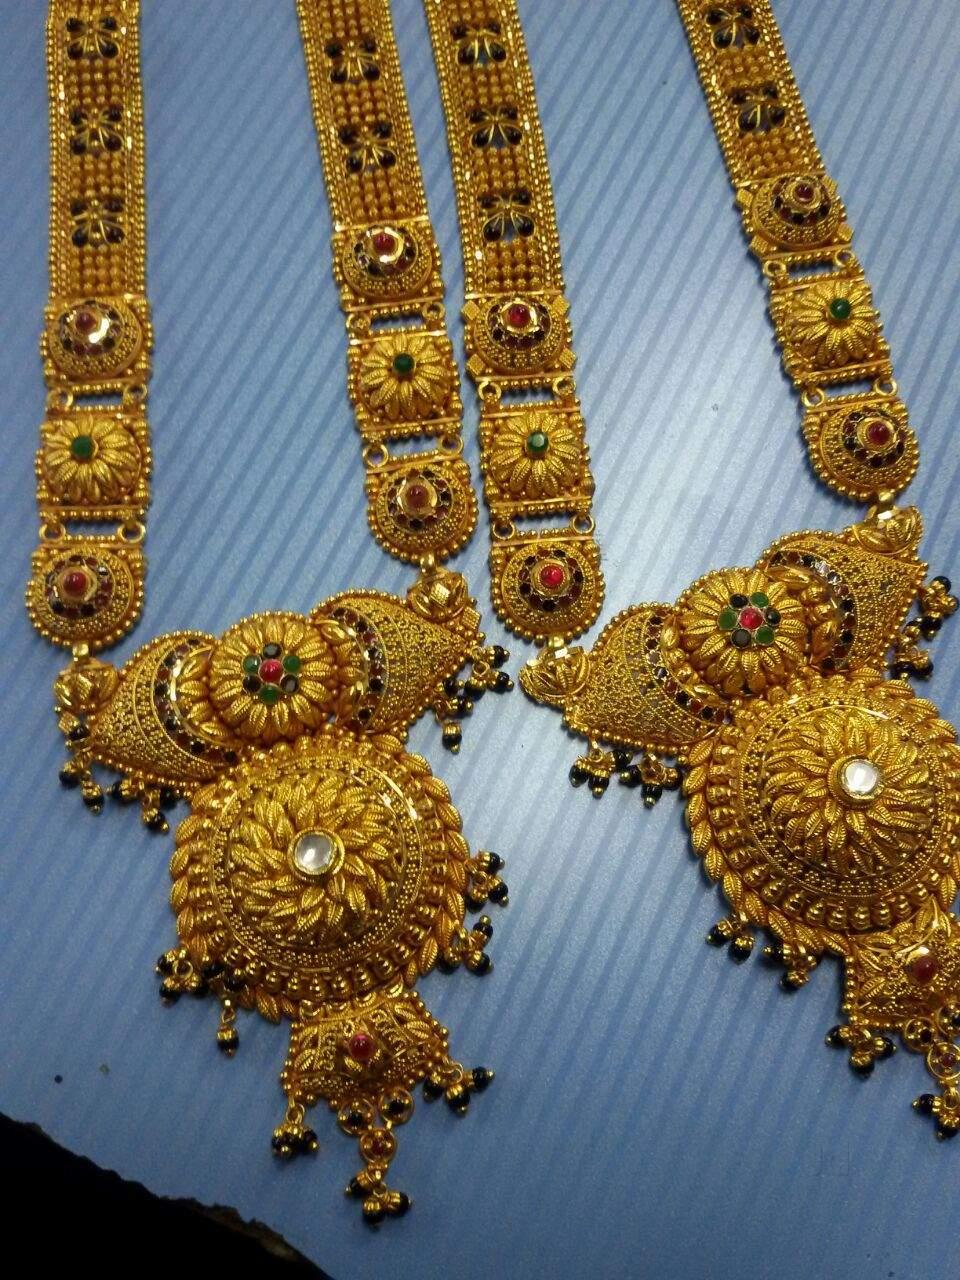 Pawan Jewellers, Hadapsar.